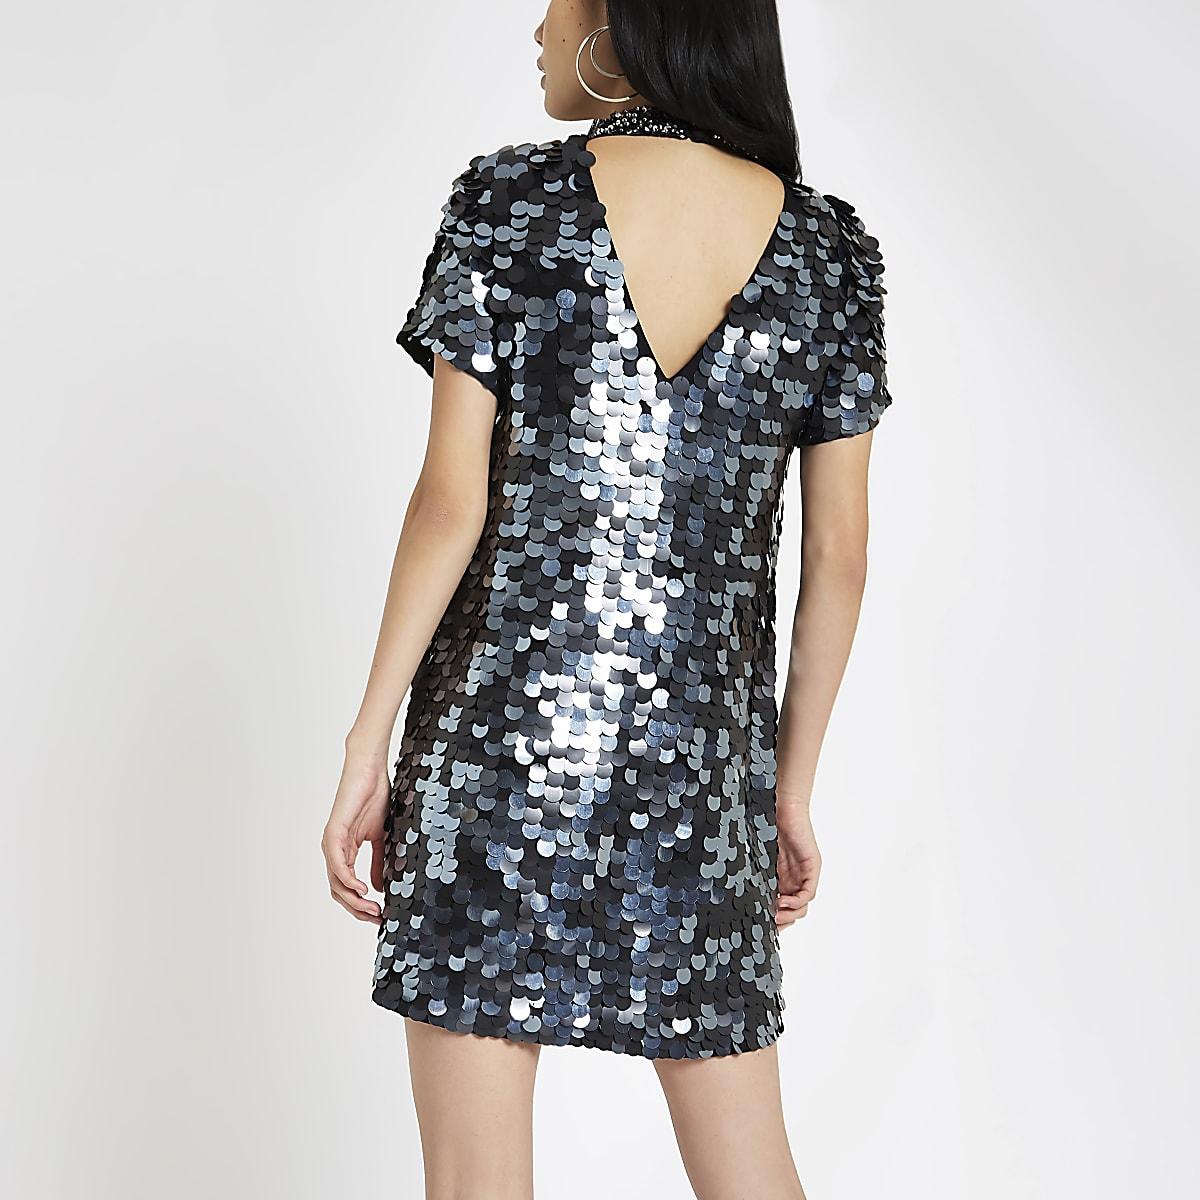 a646736fee Black sequin choker neck swing dress - Swing Dresses - Dresses - women